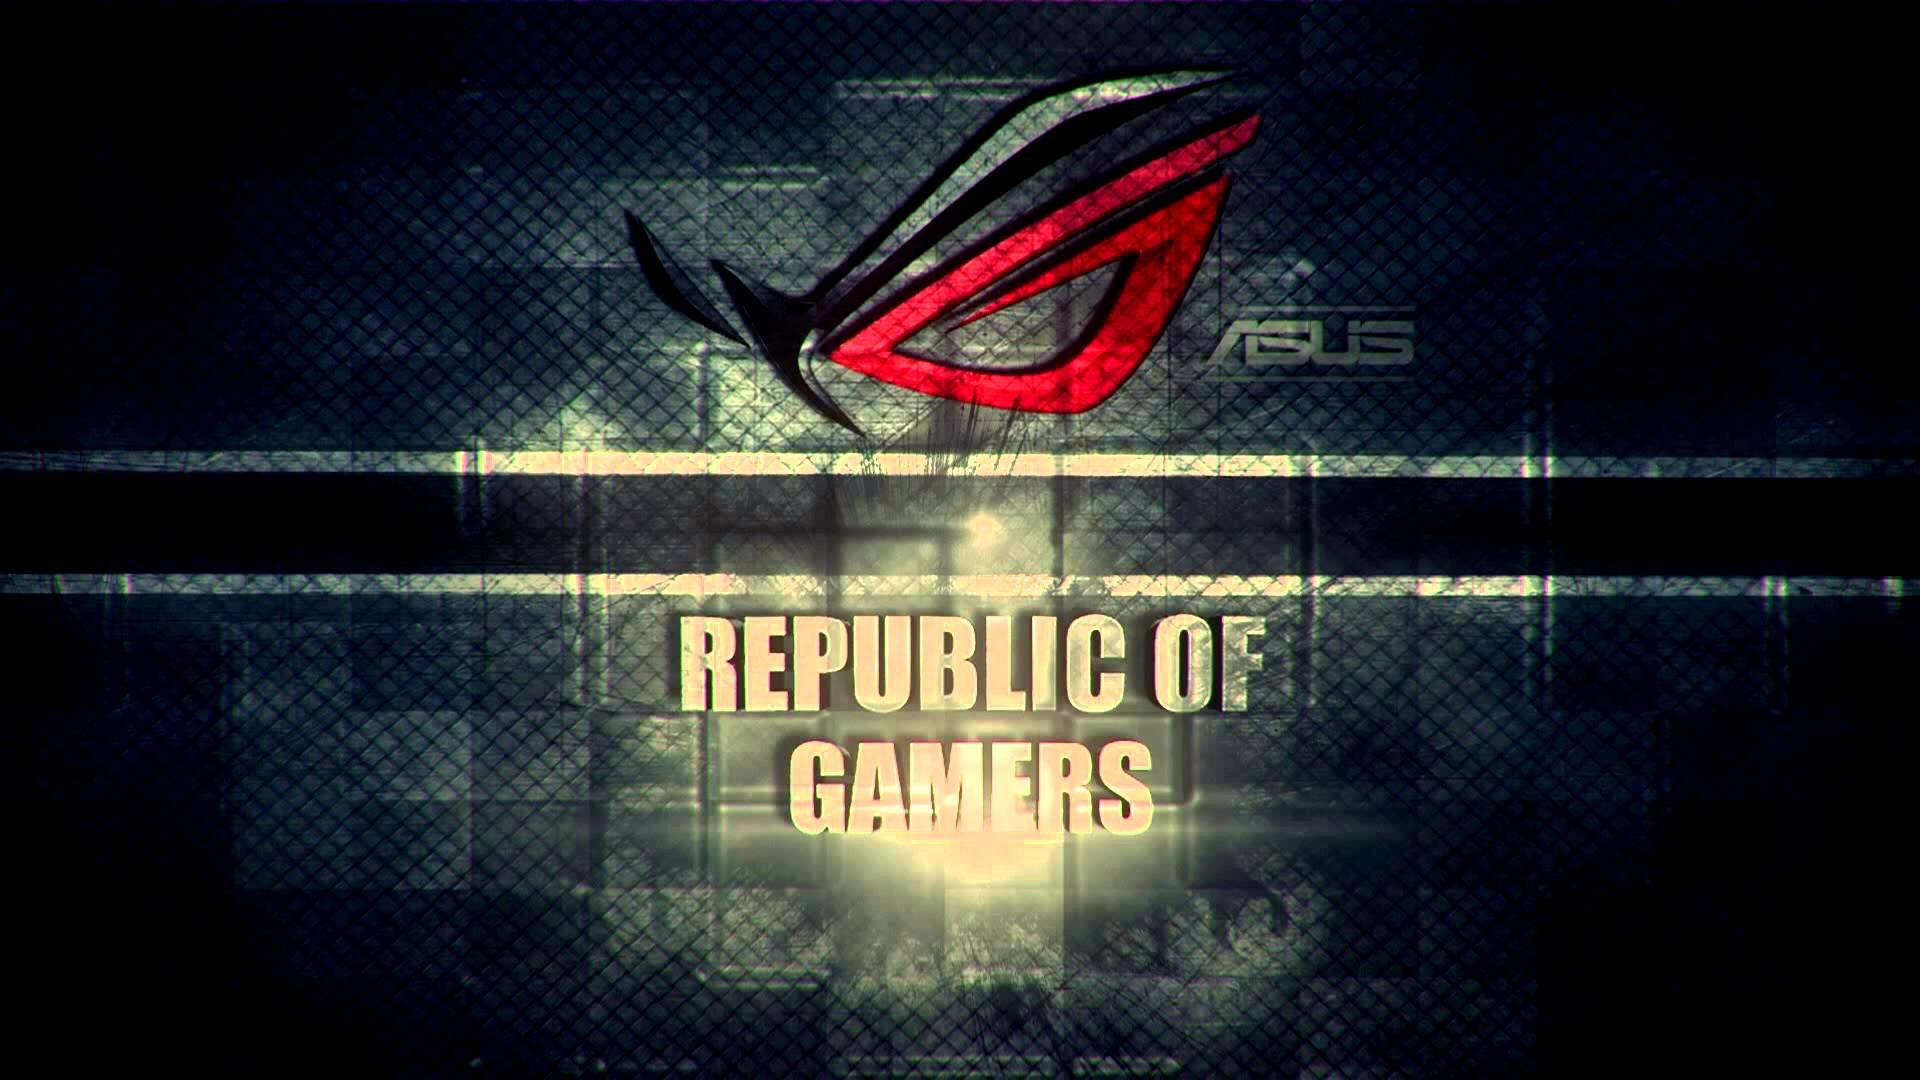 Gamers Quotes Wallpaper Republic Of Gamers Backgrounds Download Free Pixelstalk Net